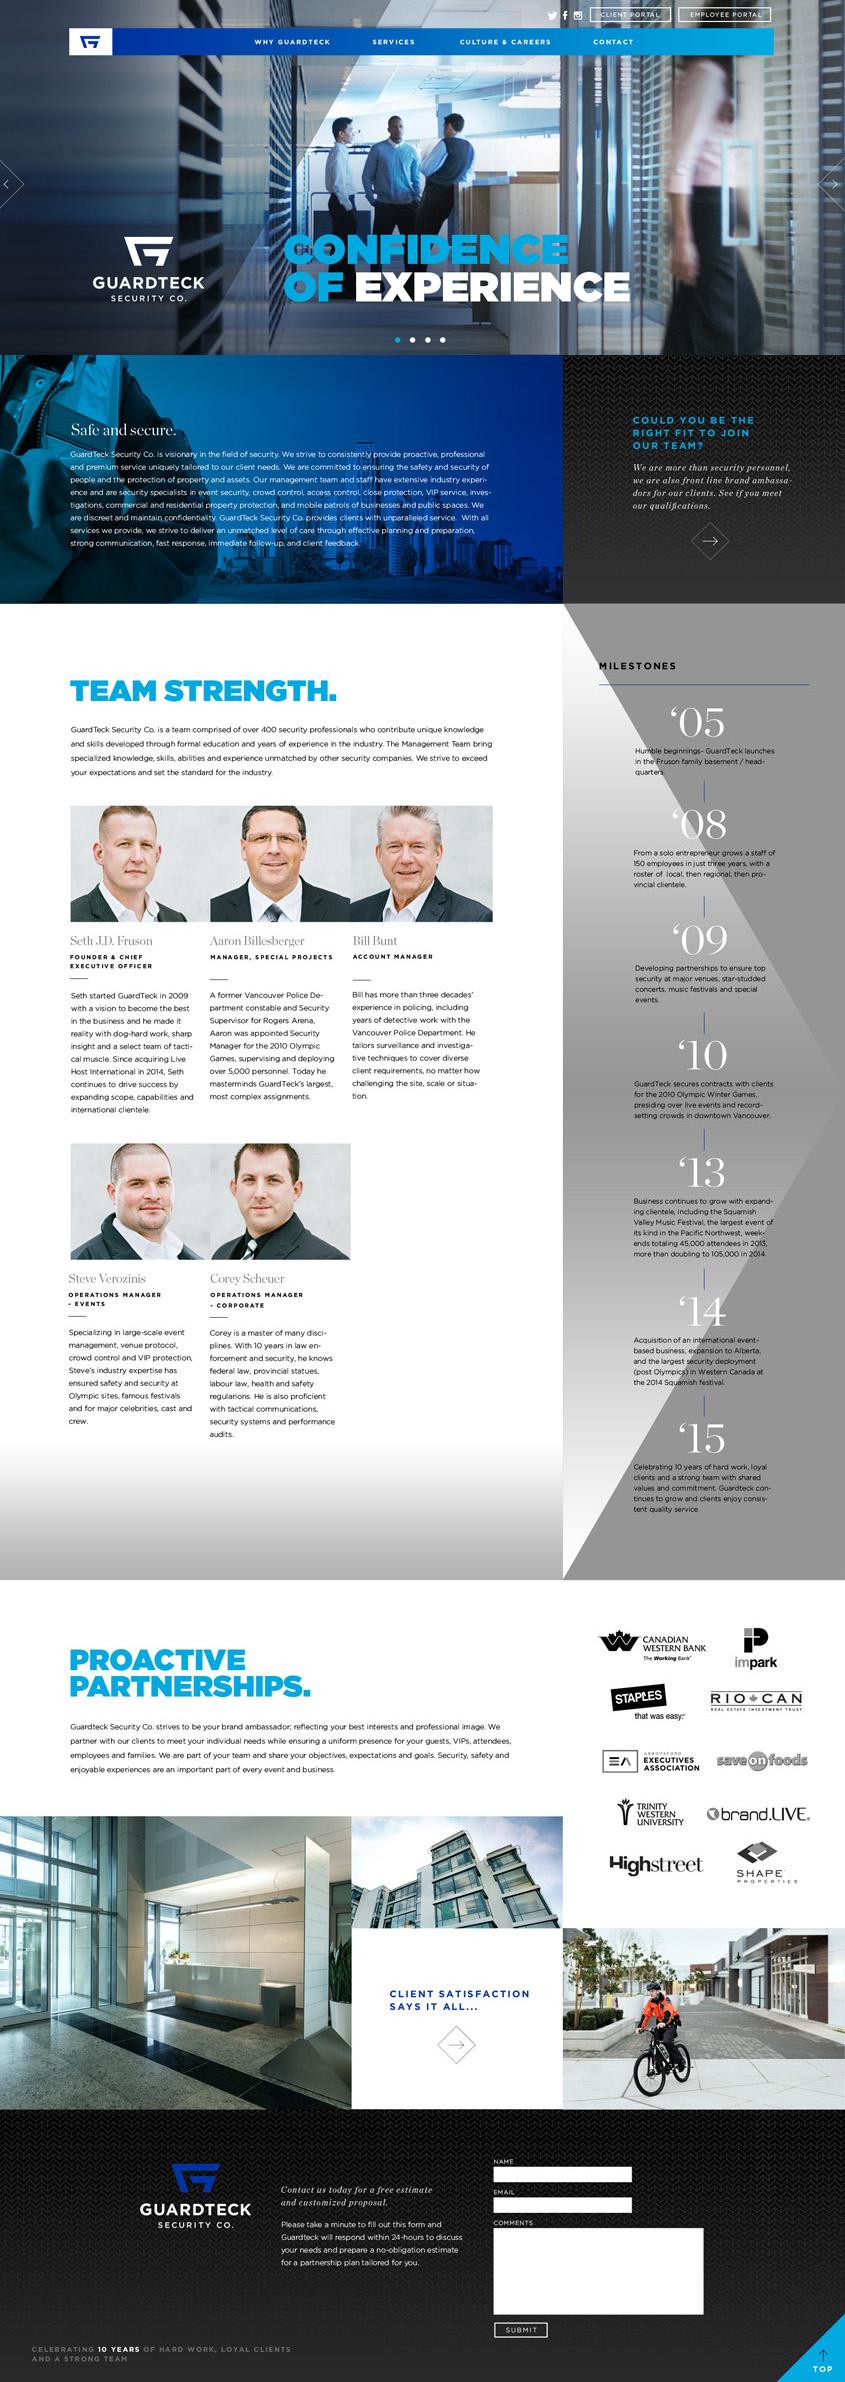 Guardteck_homepage1.jpg